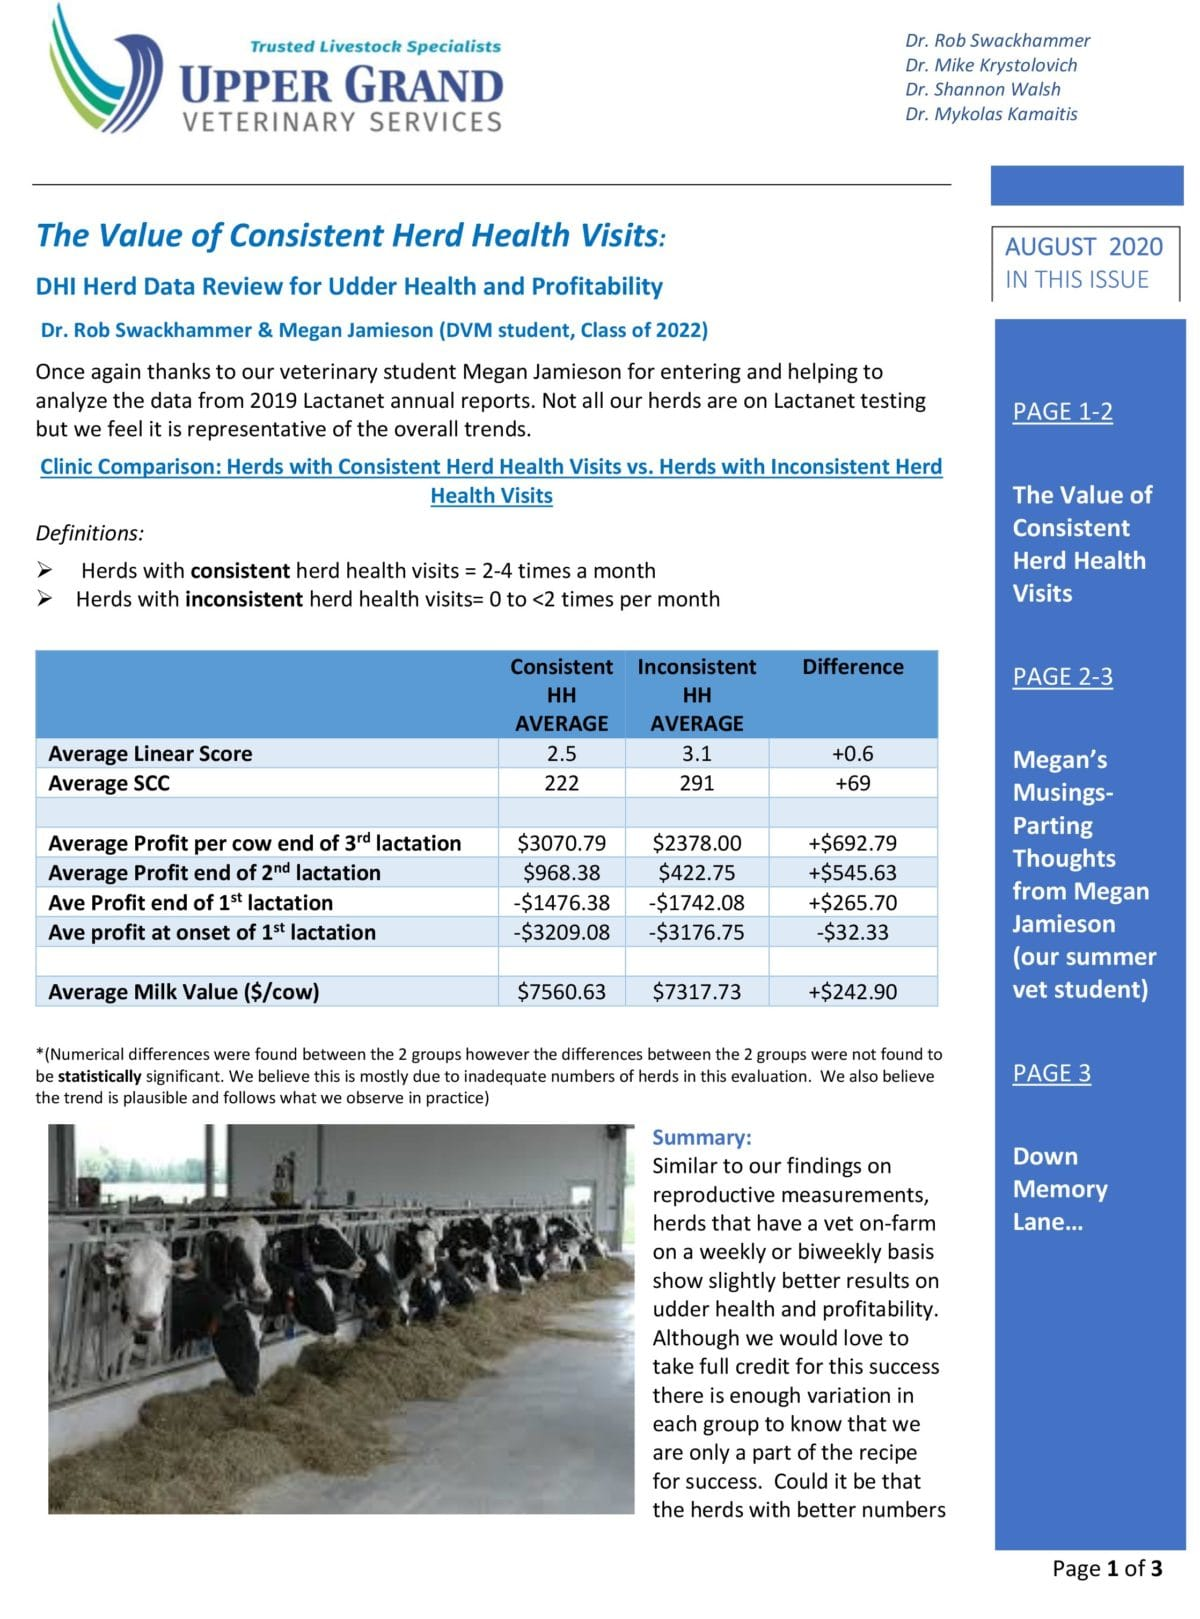 UGVS-Newsletter_08-2020-1-copy-1200x1619.jpg